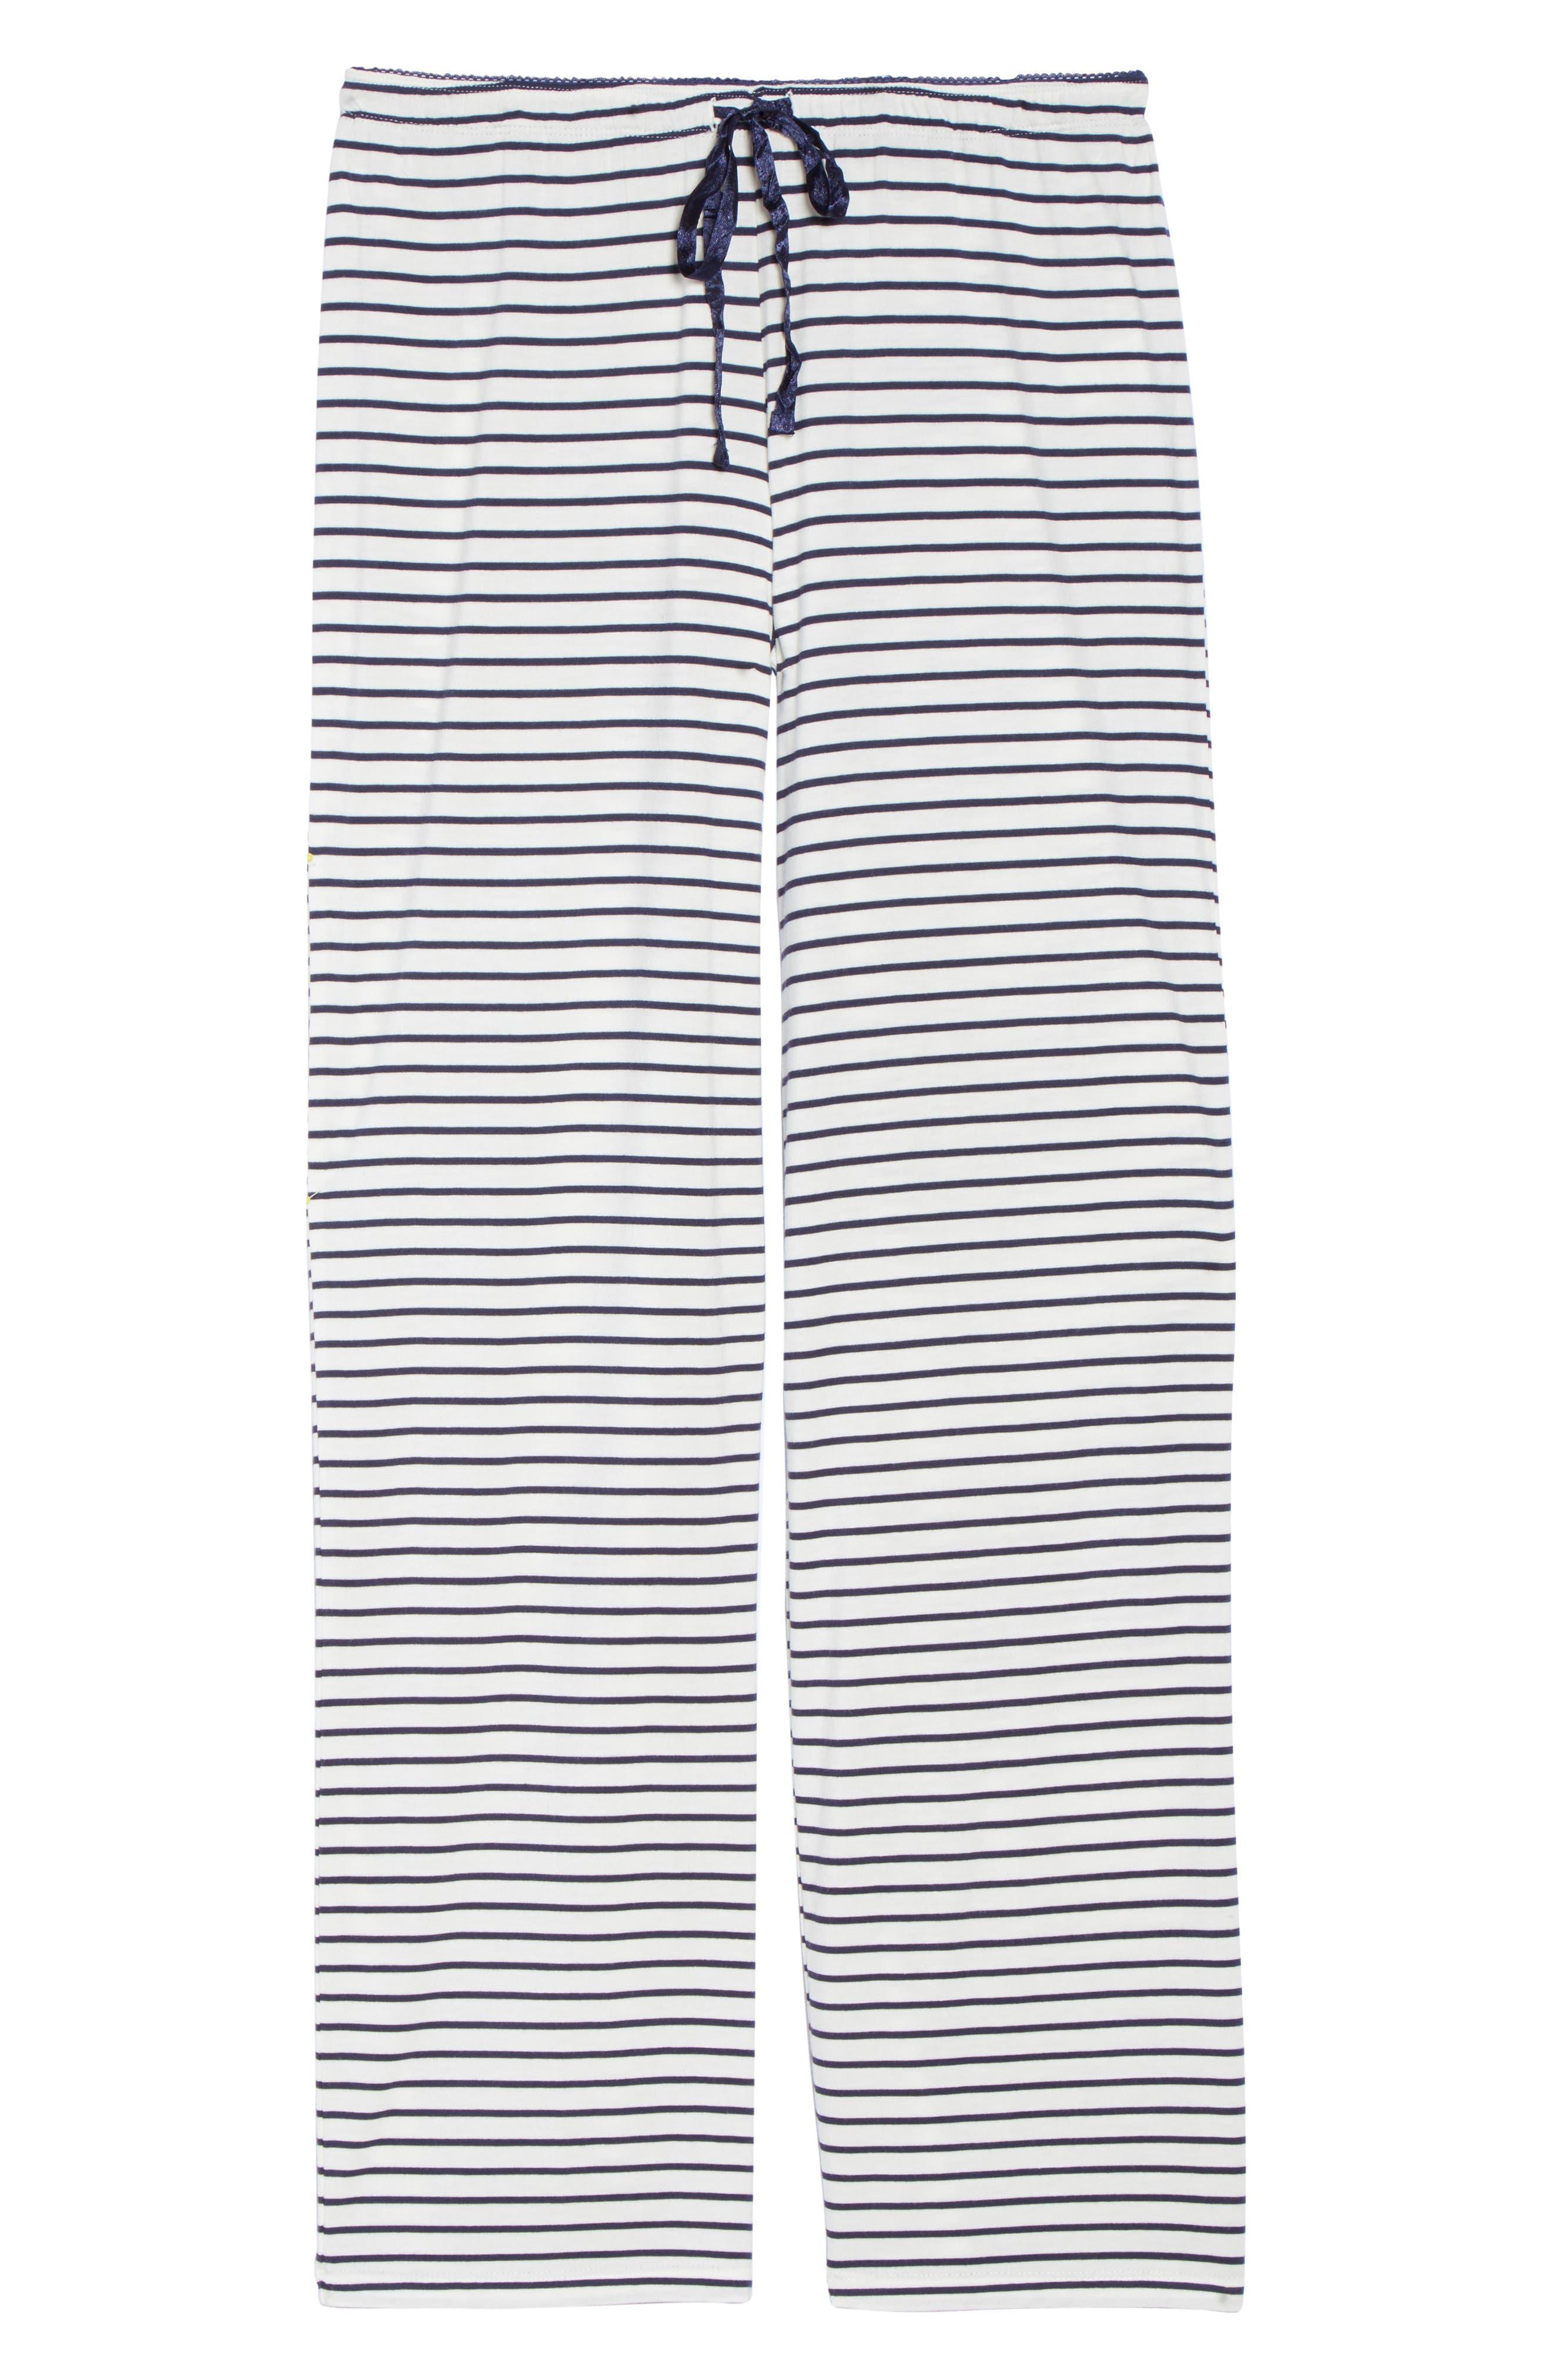 Stripe Pajama Pants,                             Alternate thumbnail 6, color,                             900